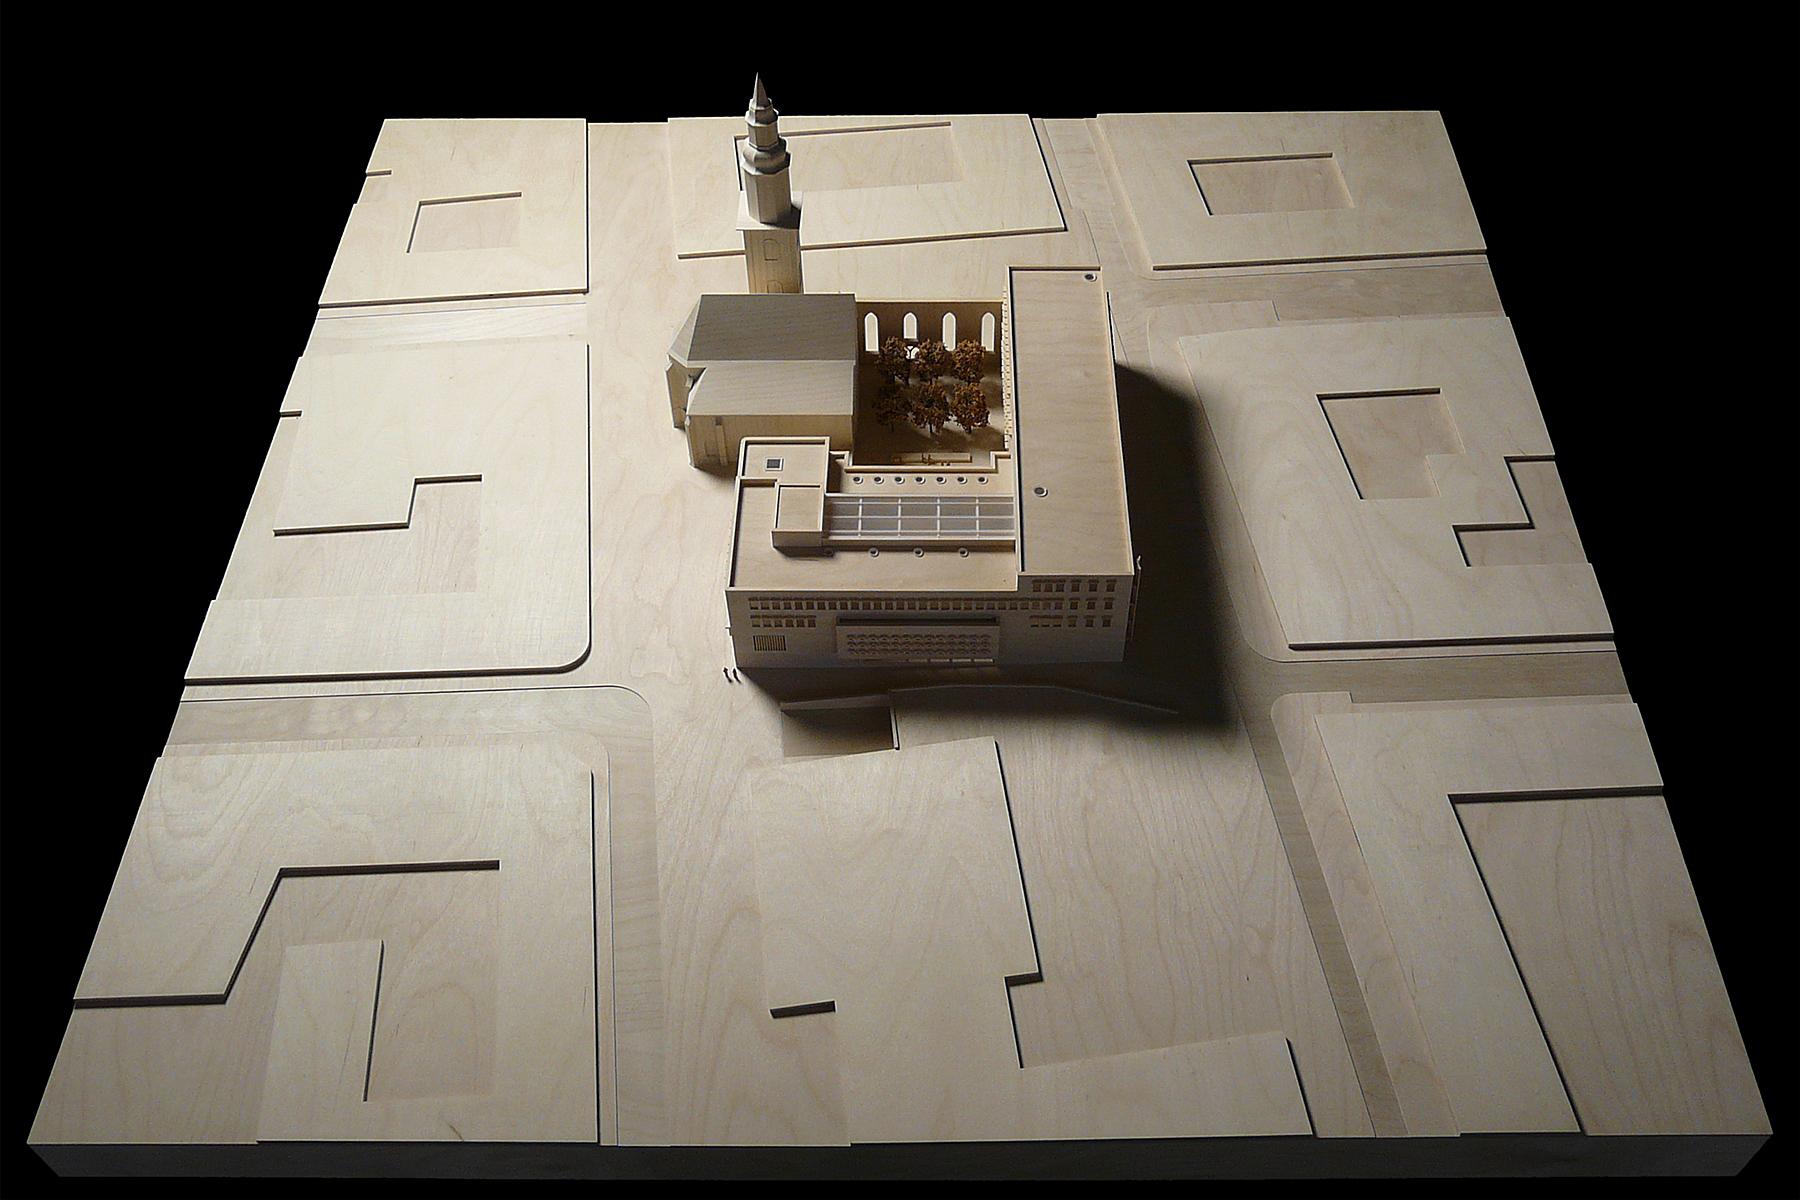 architekturmodell hospitalhof stuttgart b la berec modellbau 1 200. Black Bedroom Furniture Sets. Home Design Ideas